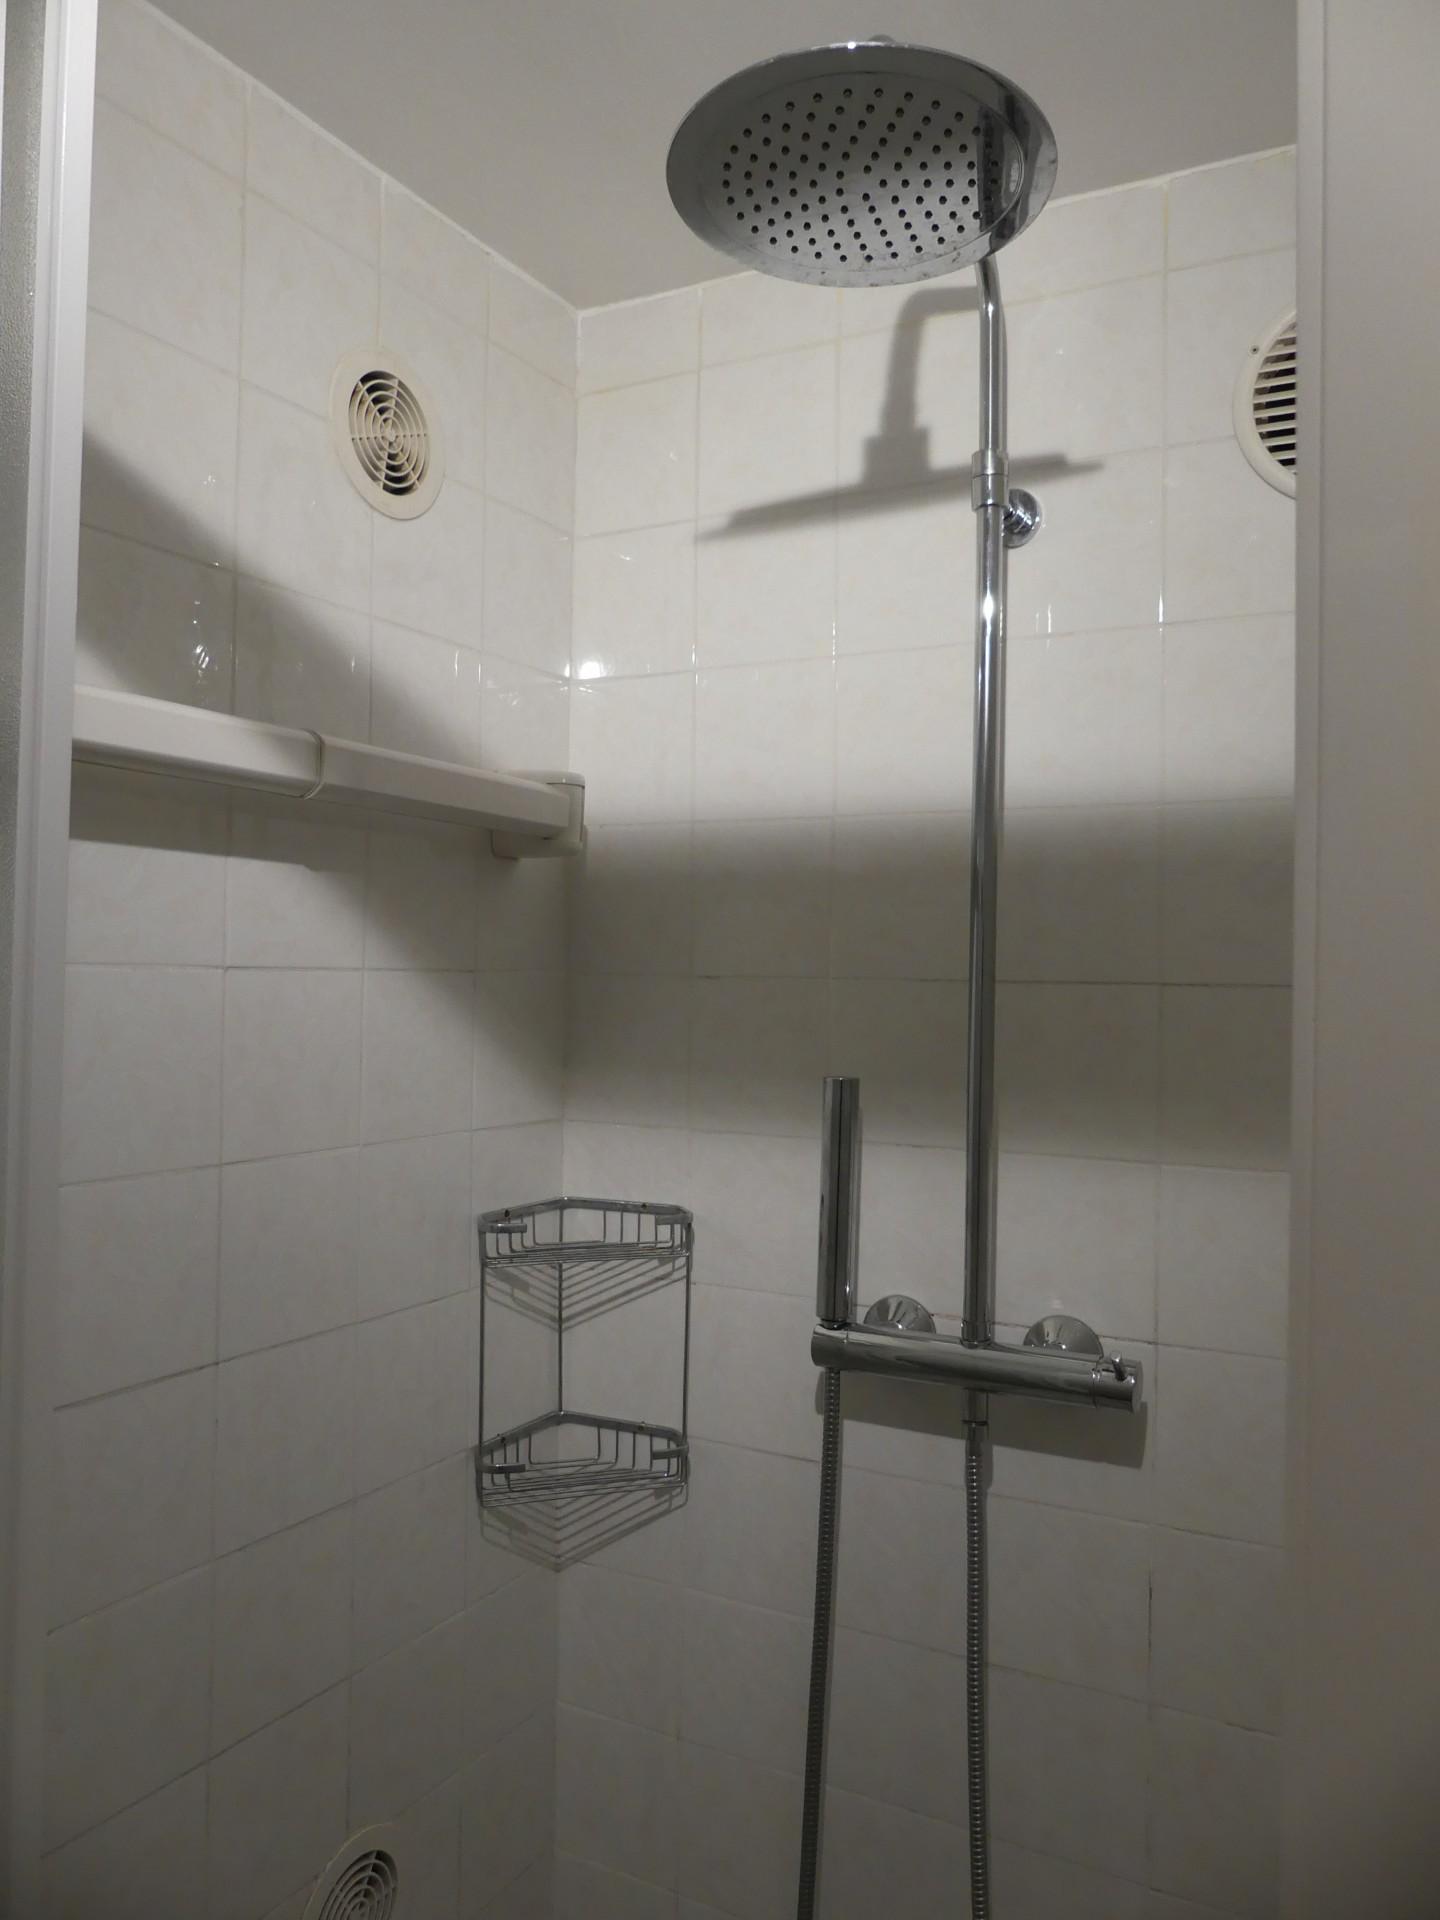 Appa 1 salle de bain